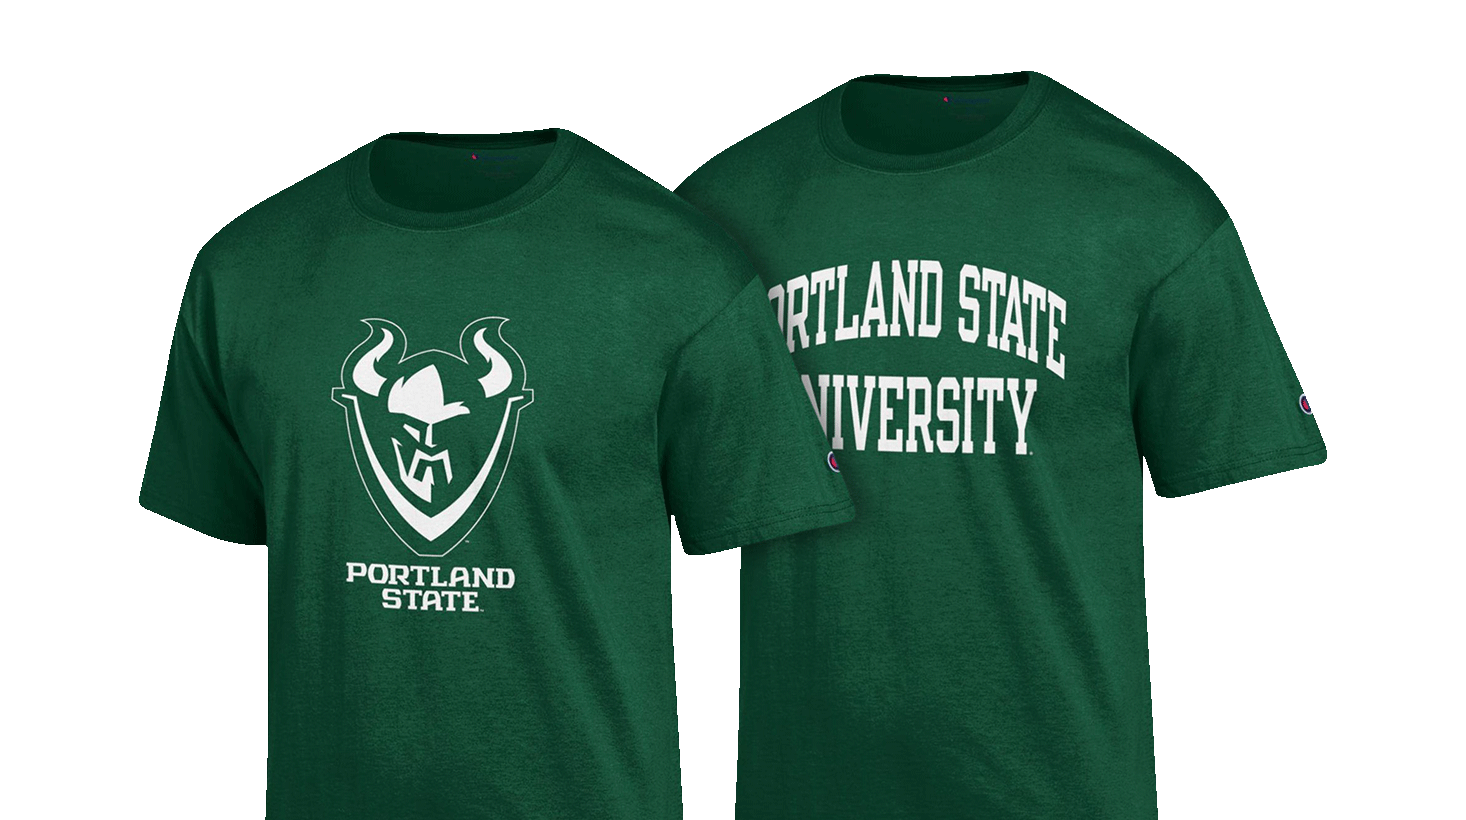 9f144fc310f04 Portland State University Apparel, Merchandise, & Gifts